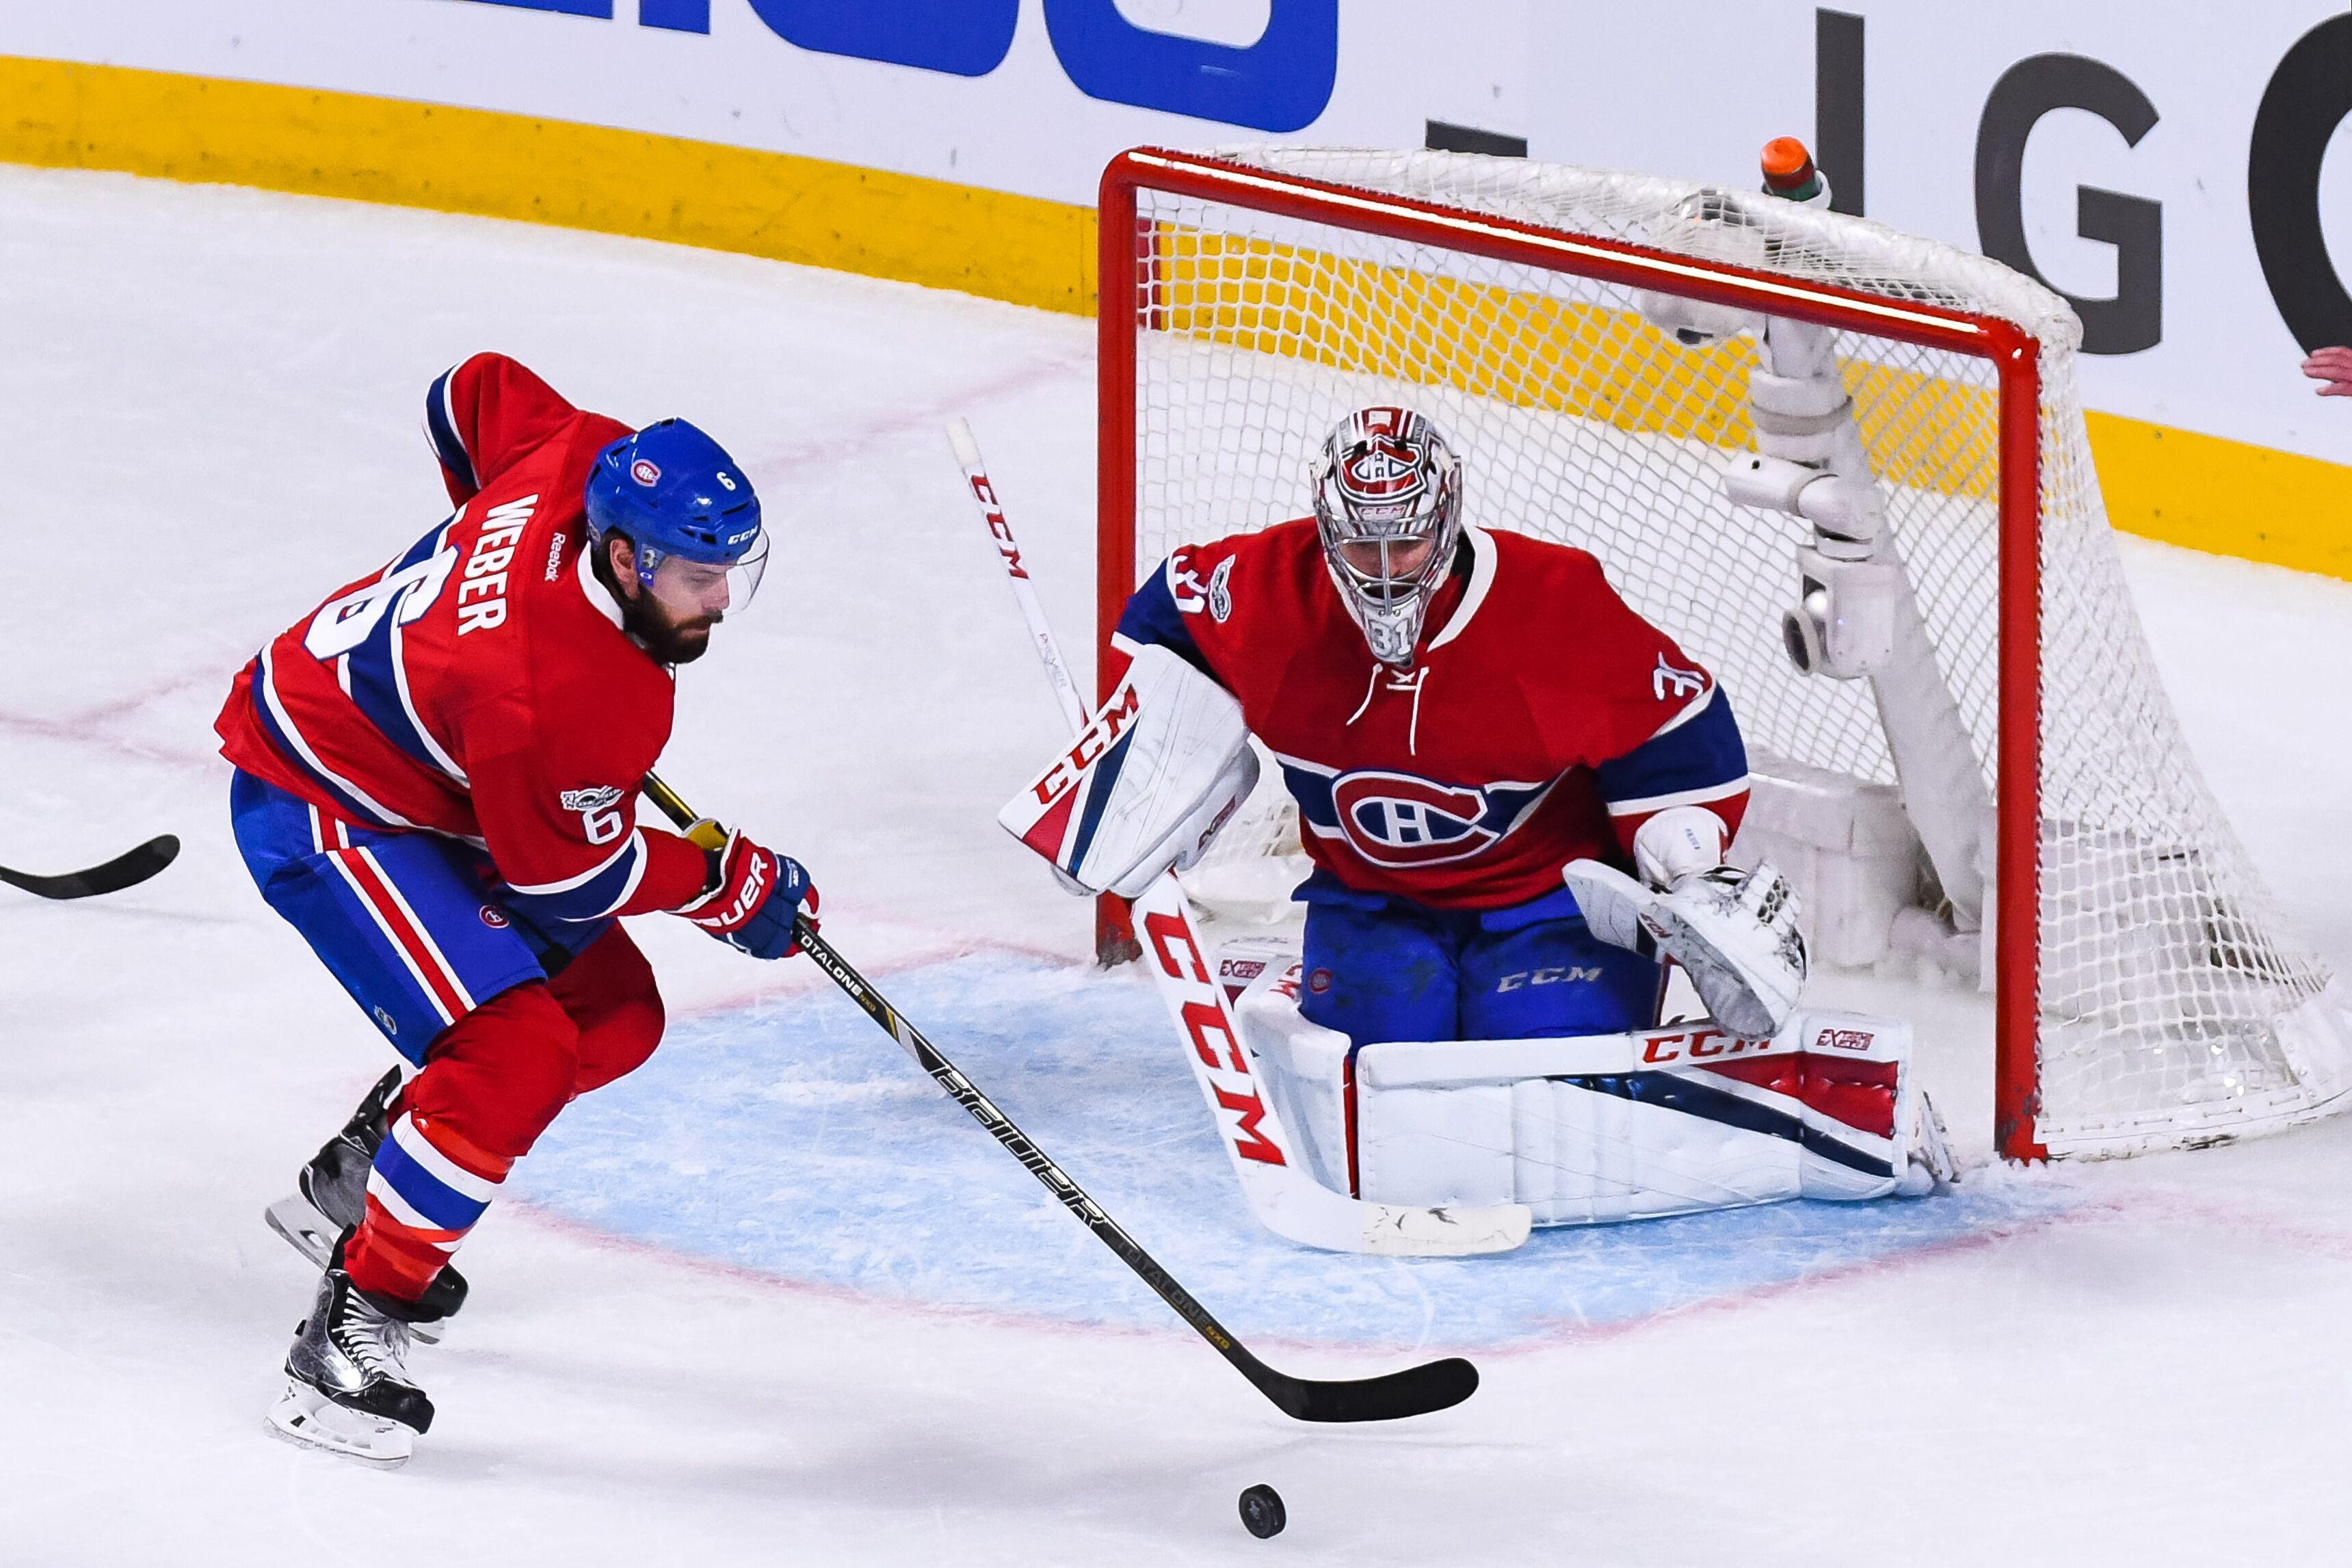 668640020-nhl-apr-14-round-1-game-2-rangers-at-canadiens.jpg